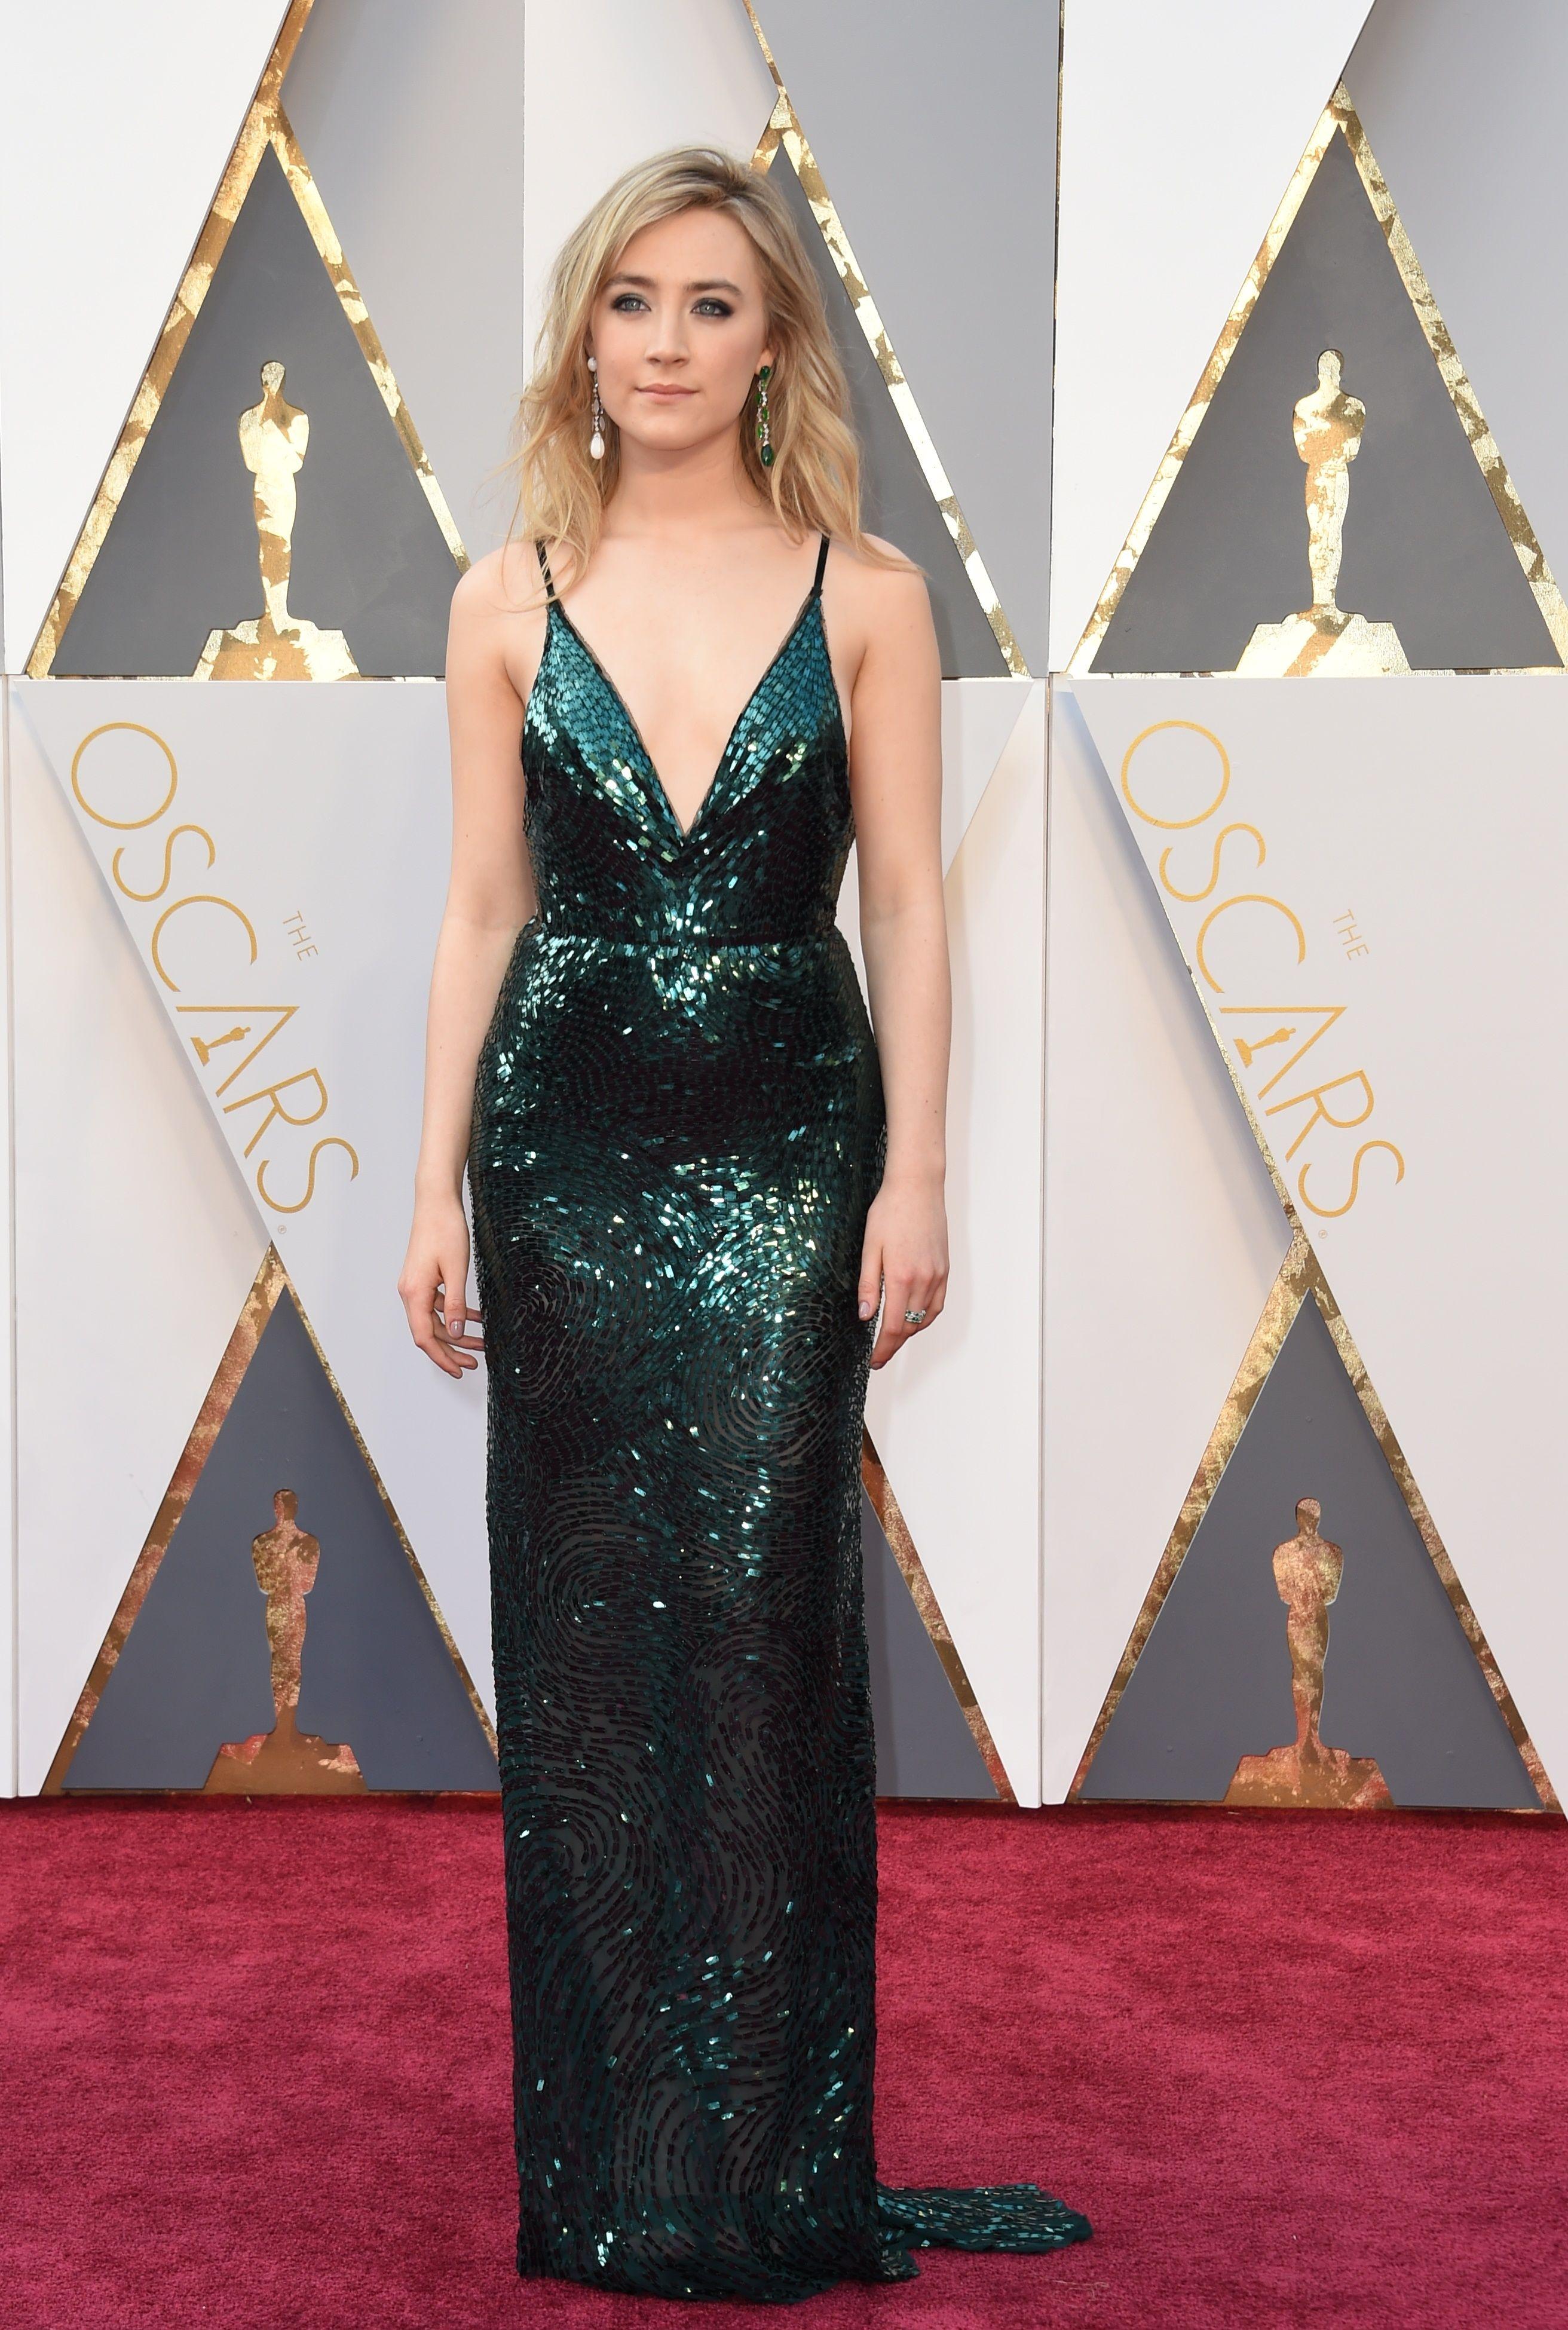 bcc87286acfd 45 Most Gorgeous Oscar Dresses - Best Academy Awards Looks